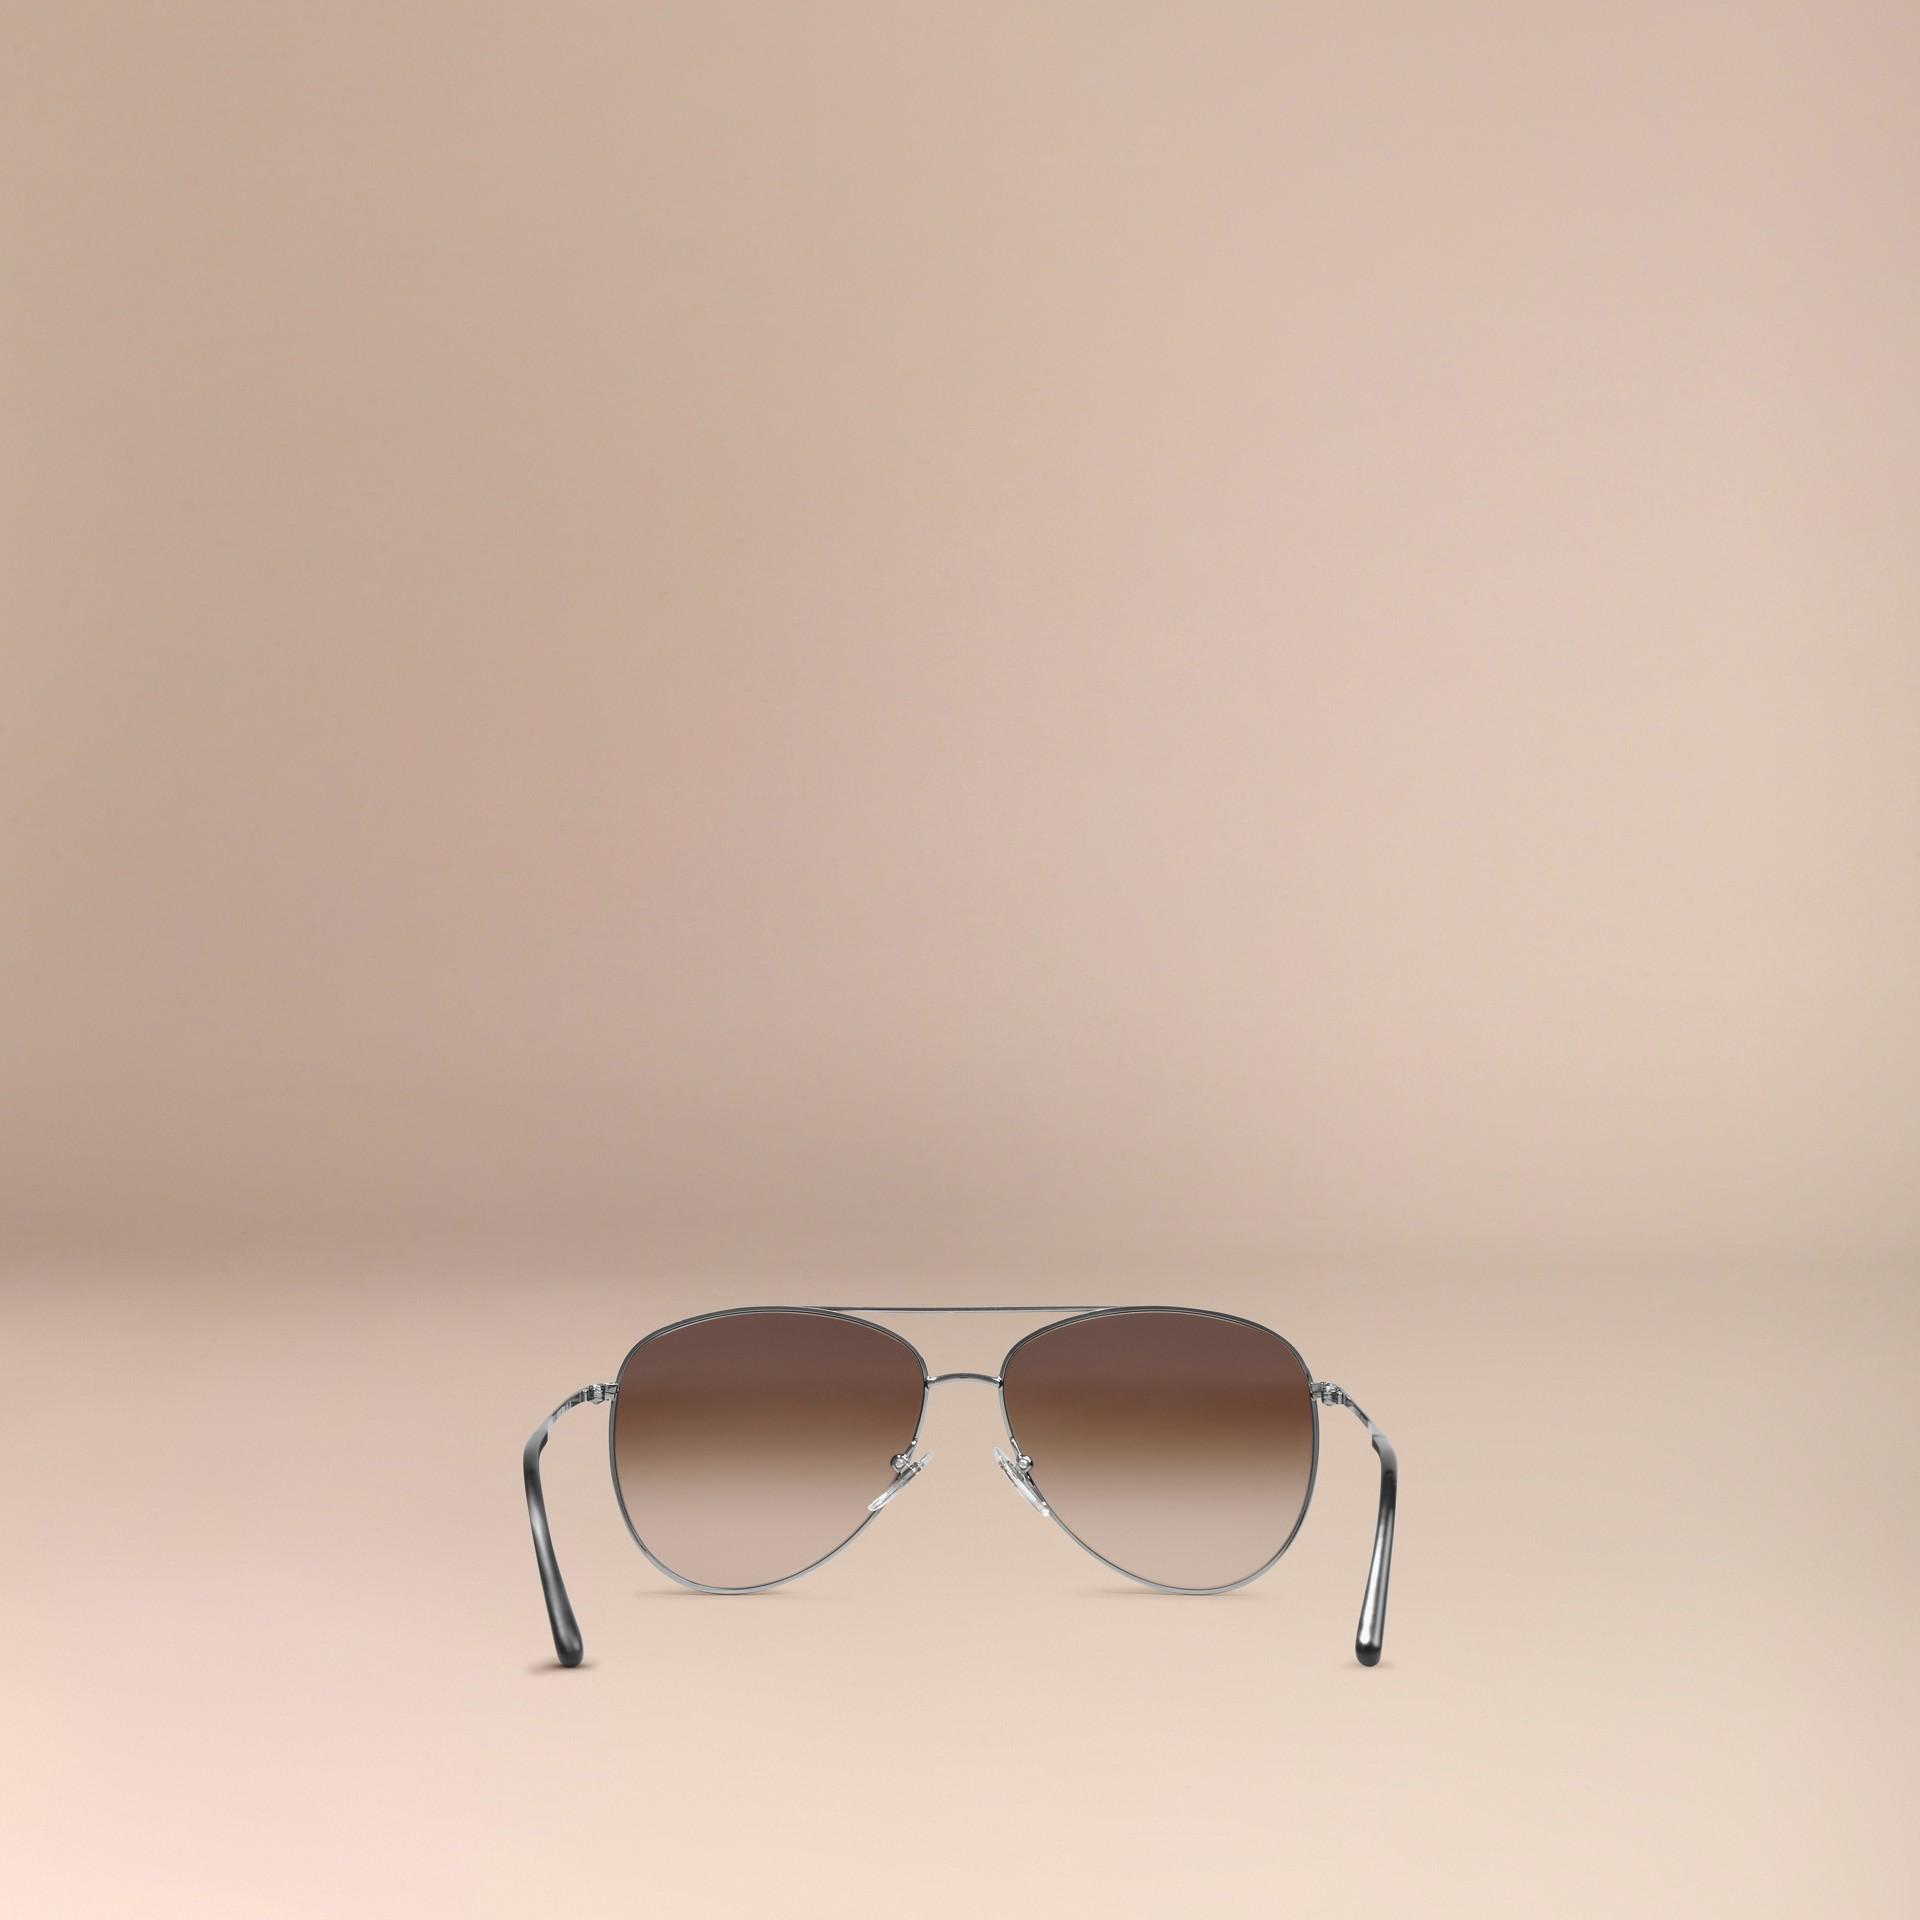 Nickel Check Arm Aviator Sunglasses Nickel - gallery image 3